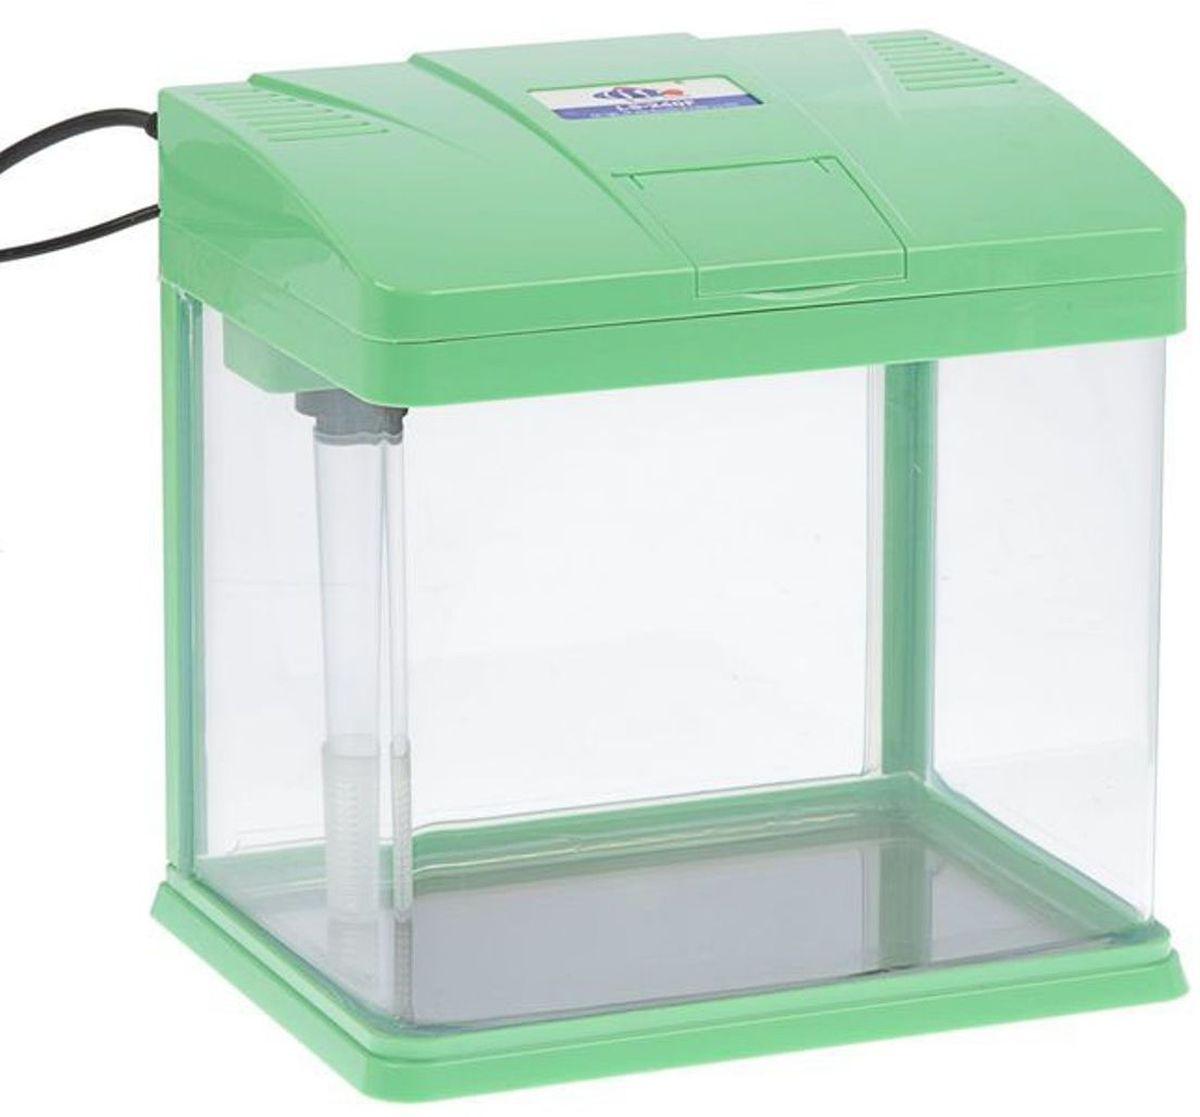 Аквариум Sea Star LS-240, цвет: зеленый, 10 л фильтр sea star каскад hx 004 1101293